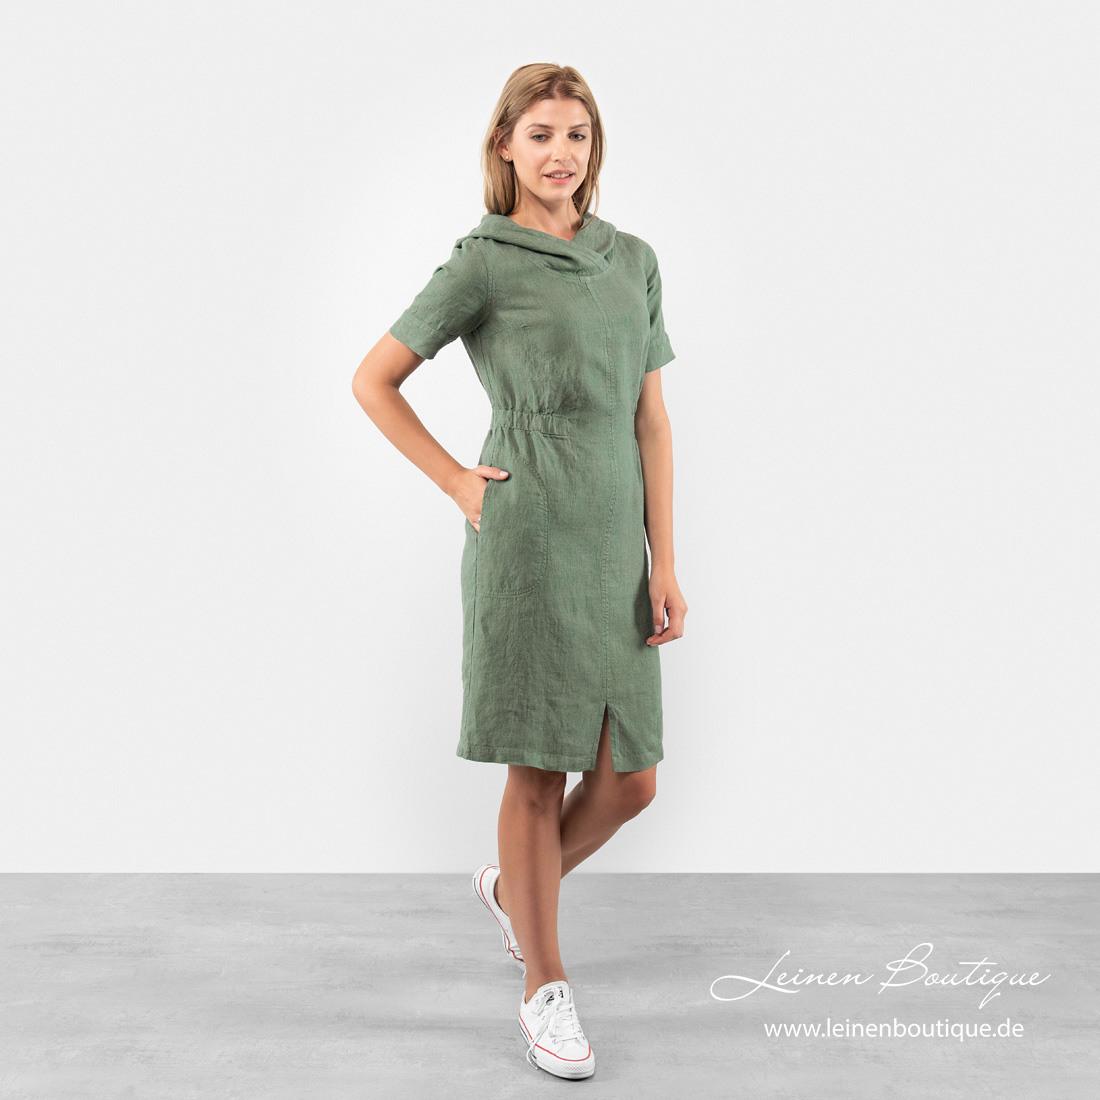 Grünes Leinenkleid Mit Kapuze Knielang  Leinen Boutique